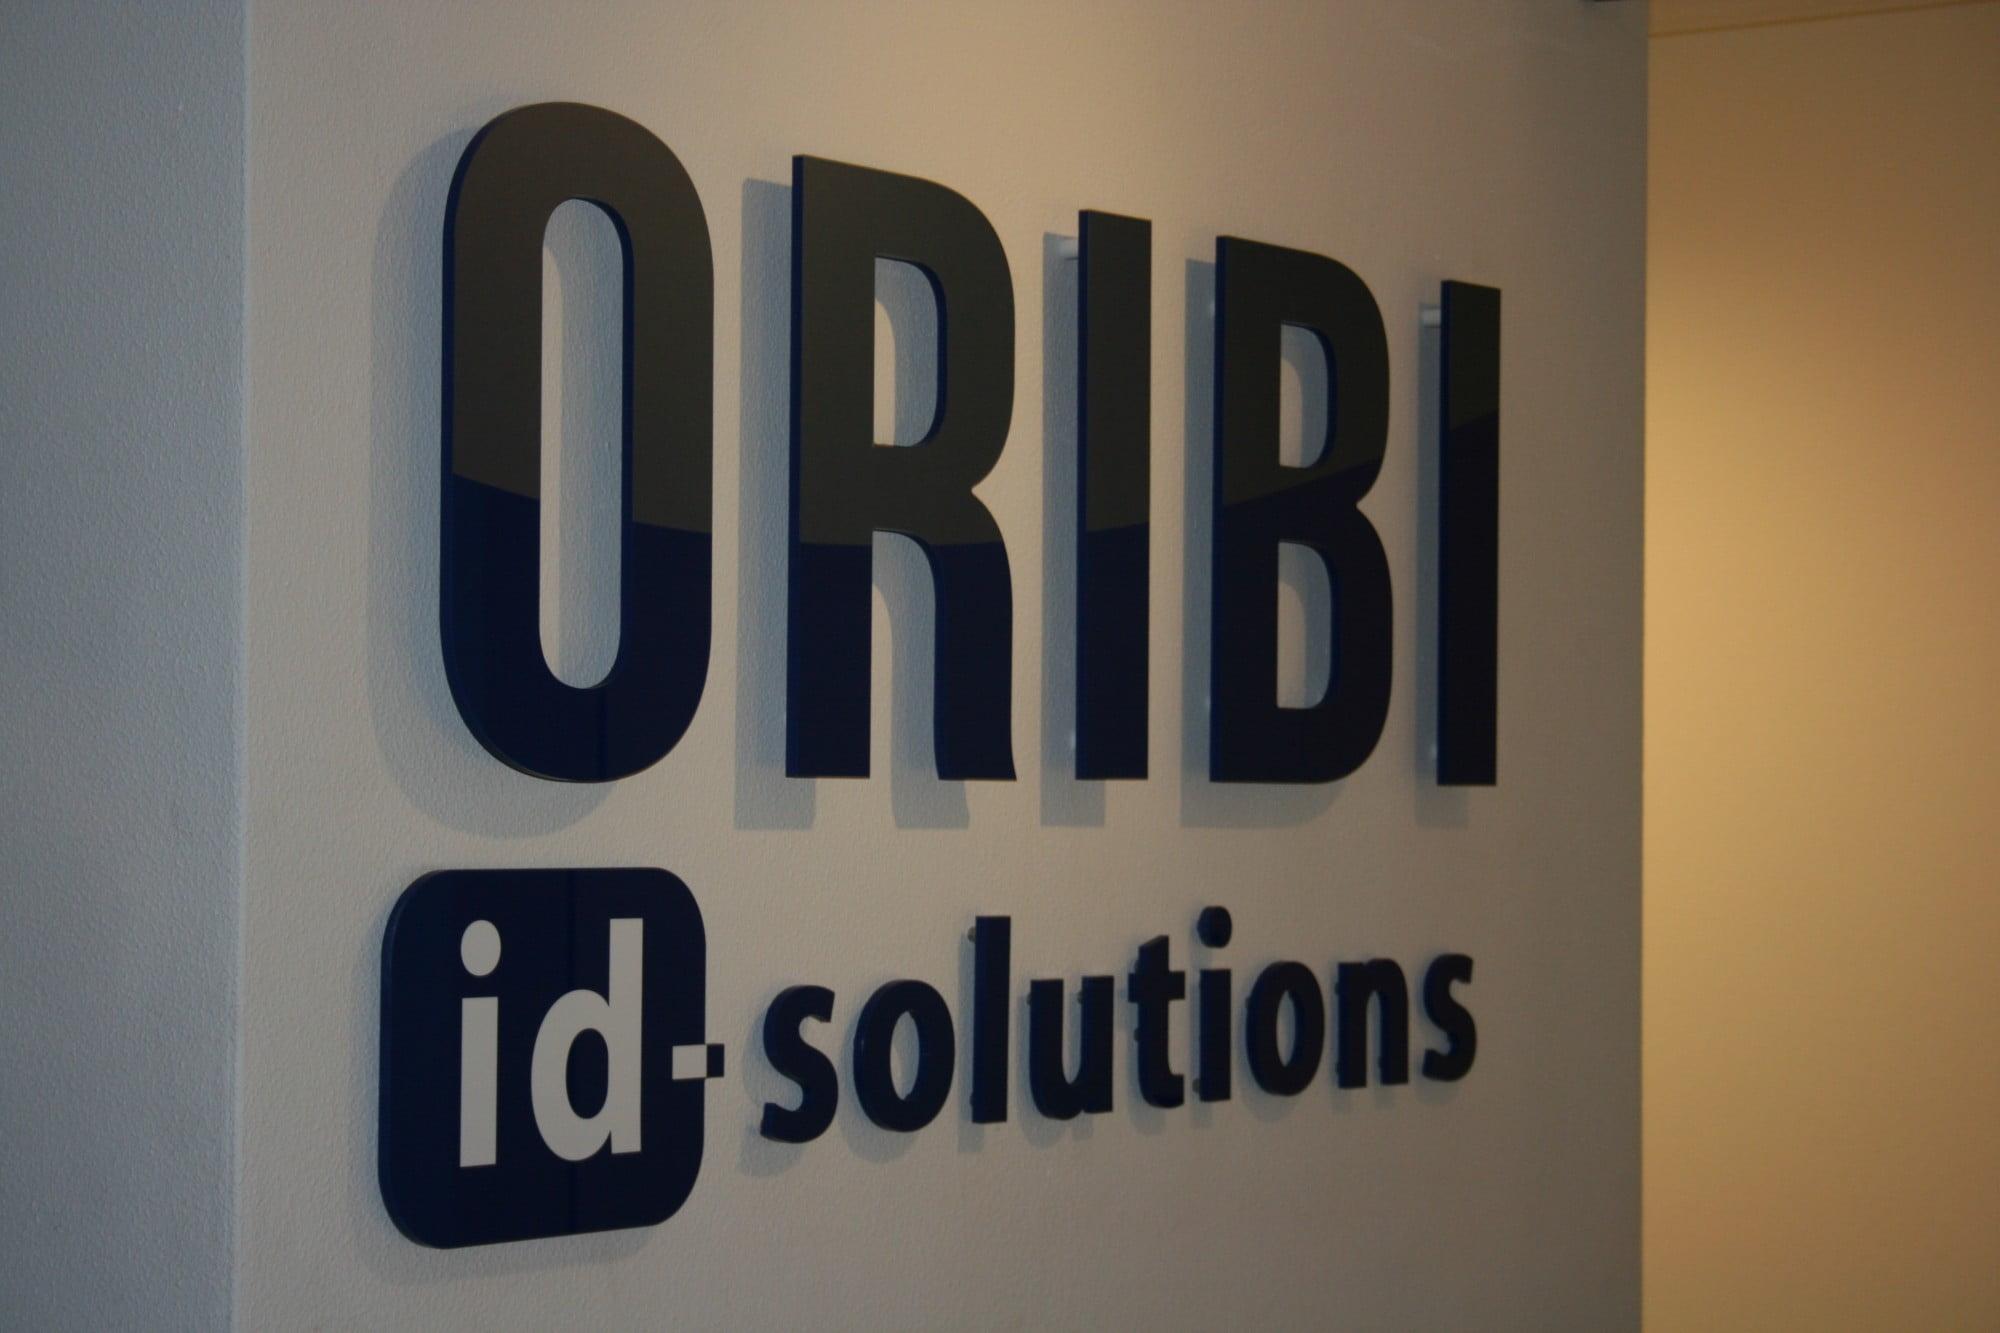 Oribi ID Solutions